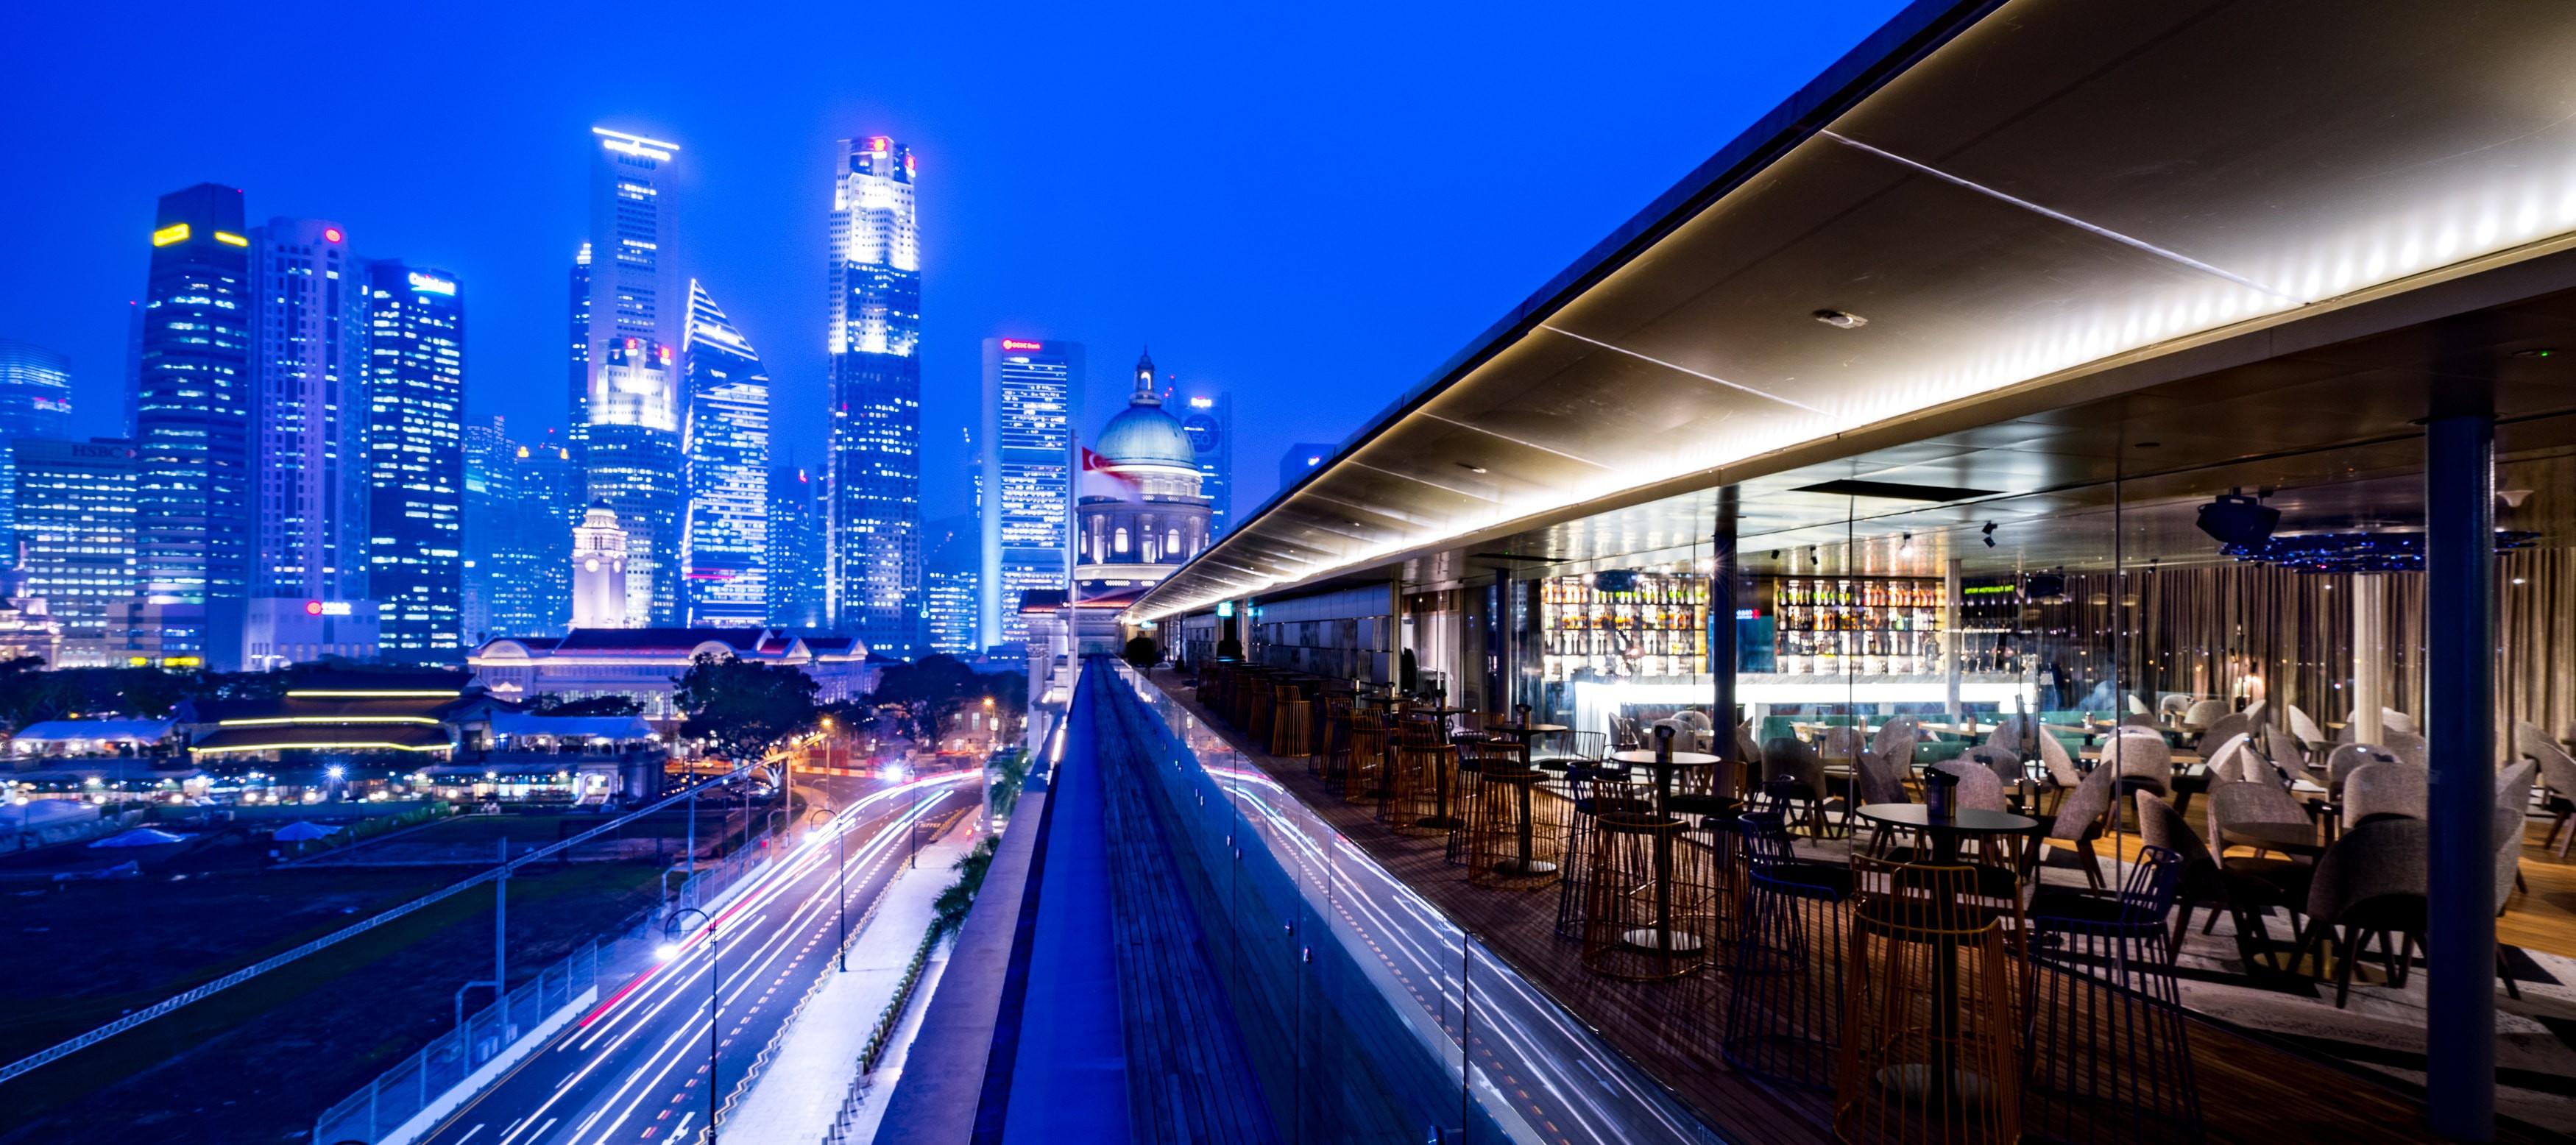 Aura Sky Lounge boasts an amazing view of the Singapore skyline